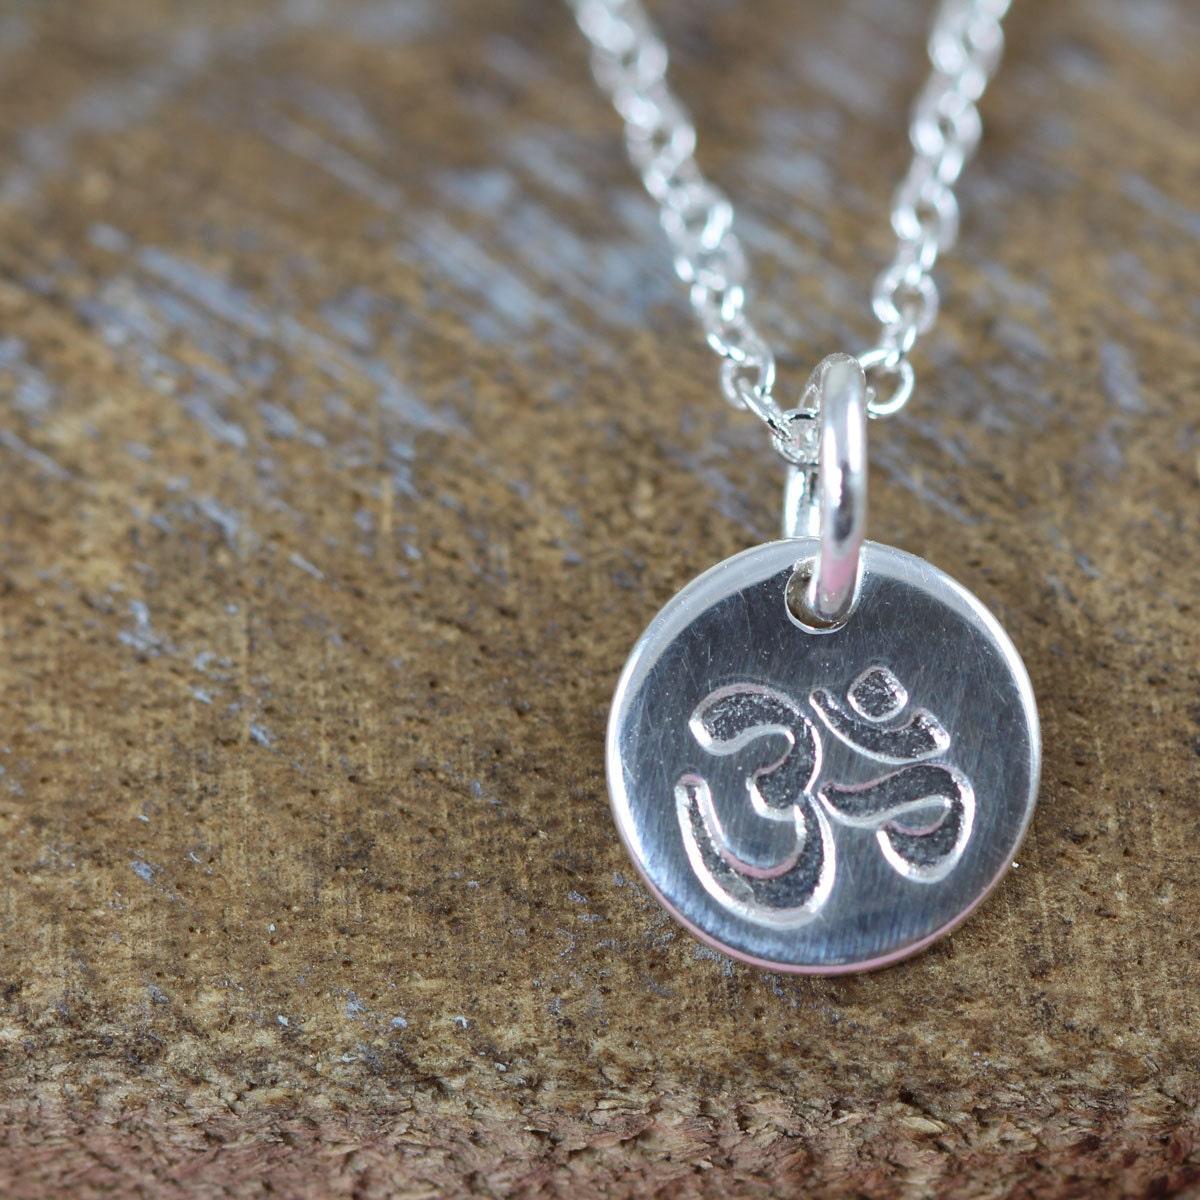 ohm necklace om charm aum pendant spiritual jewelry gift